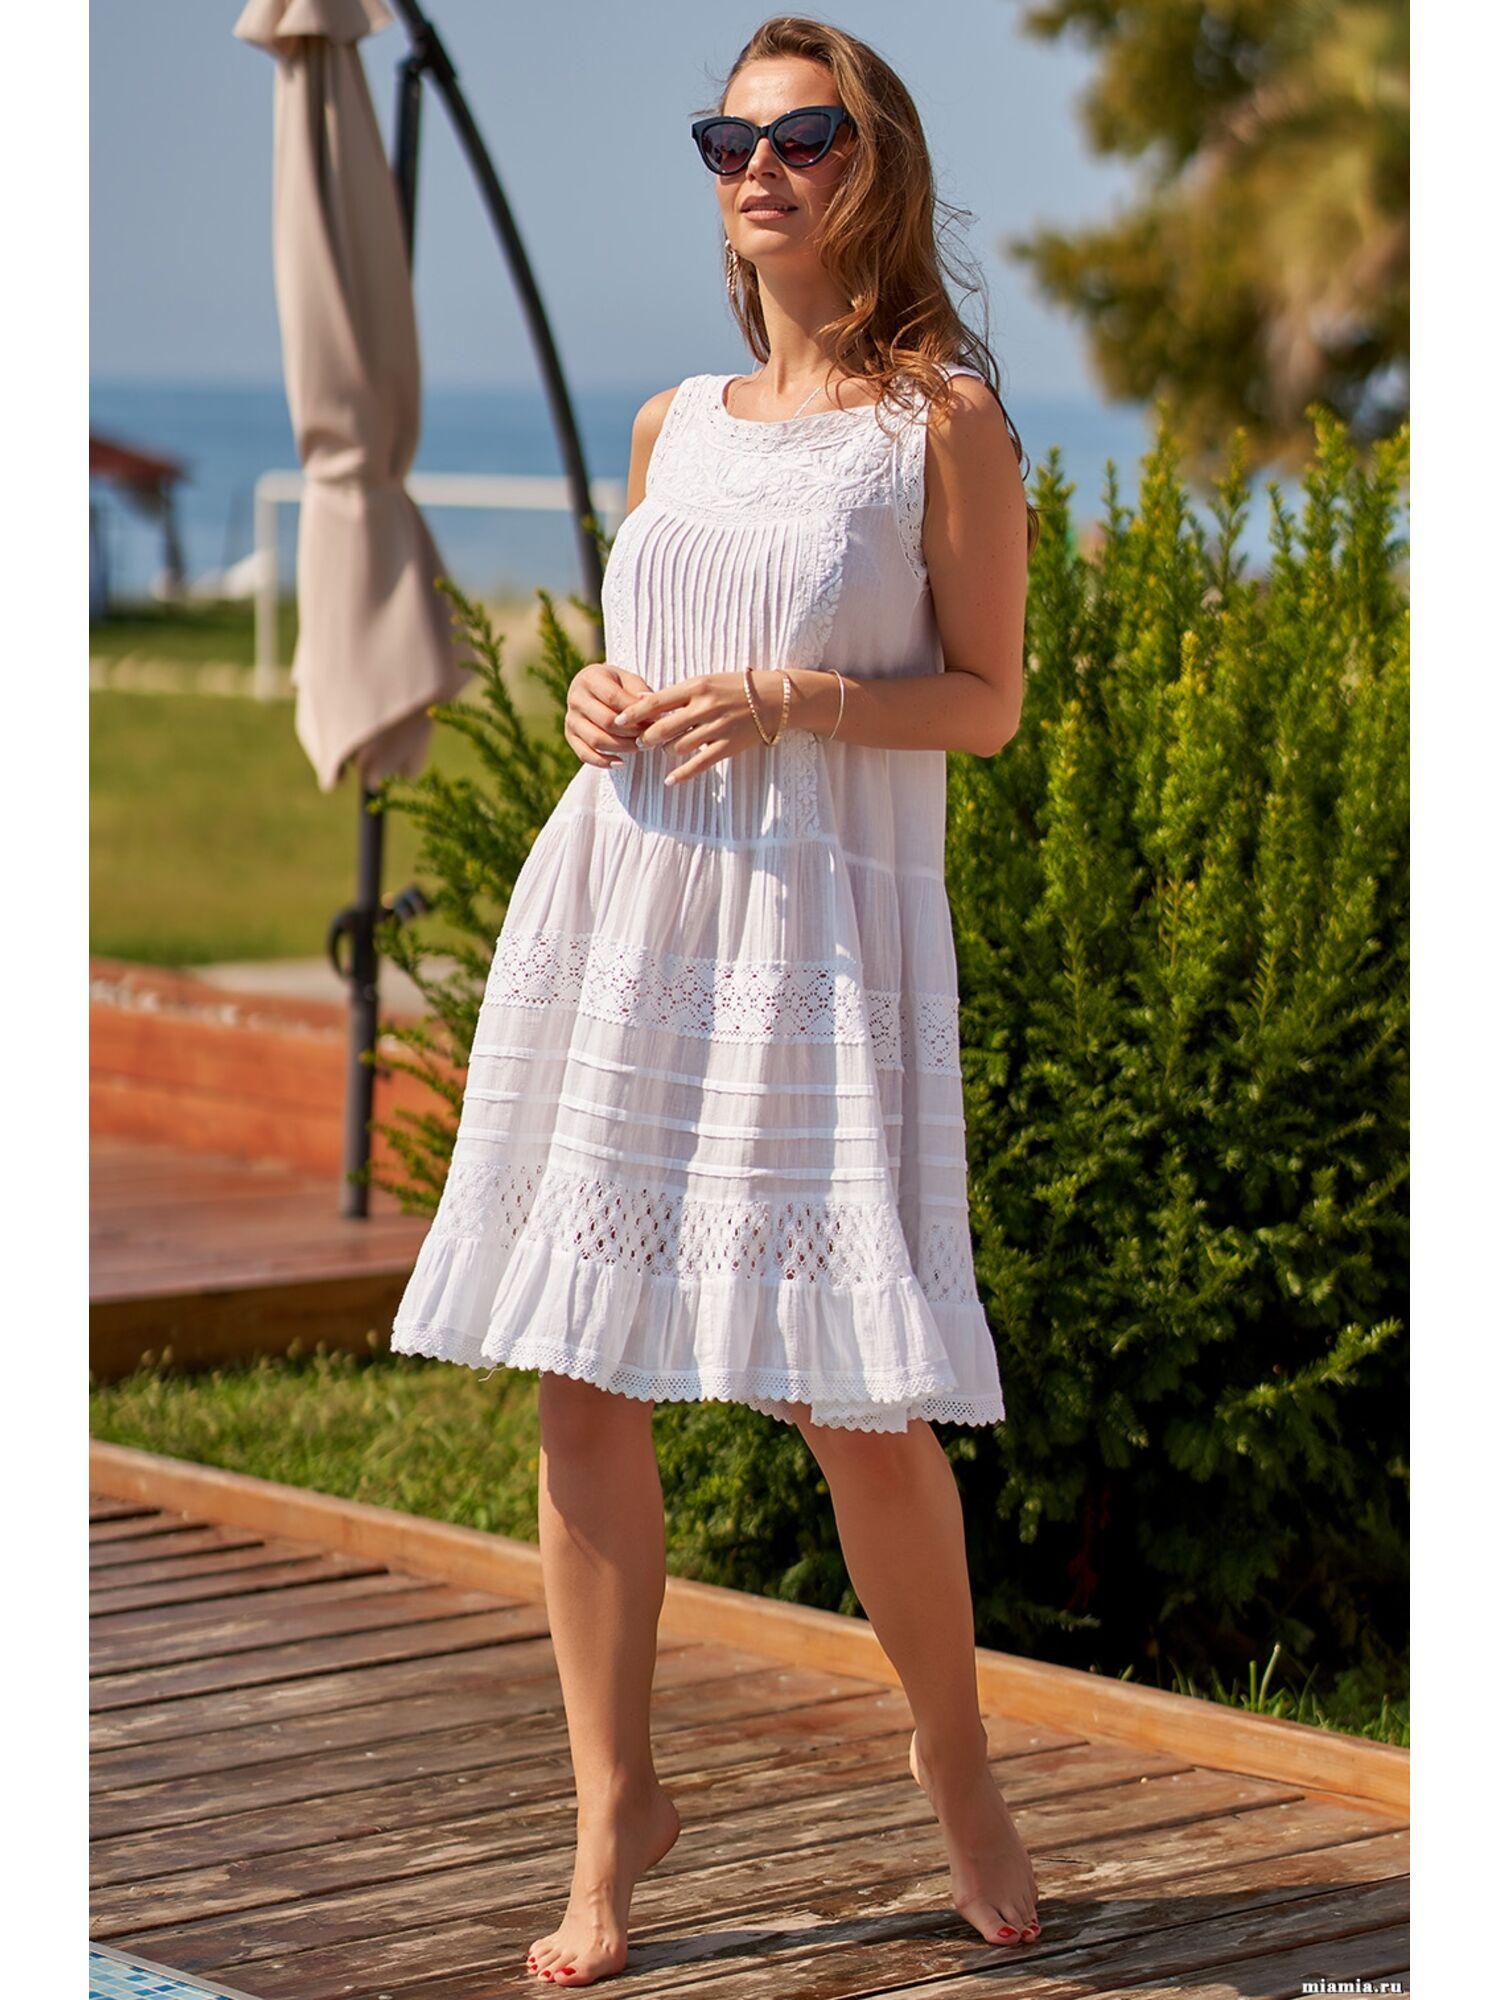 Сарафан, туника пляжная хлопковая Доминикана 1375, белый, Mia-Amore